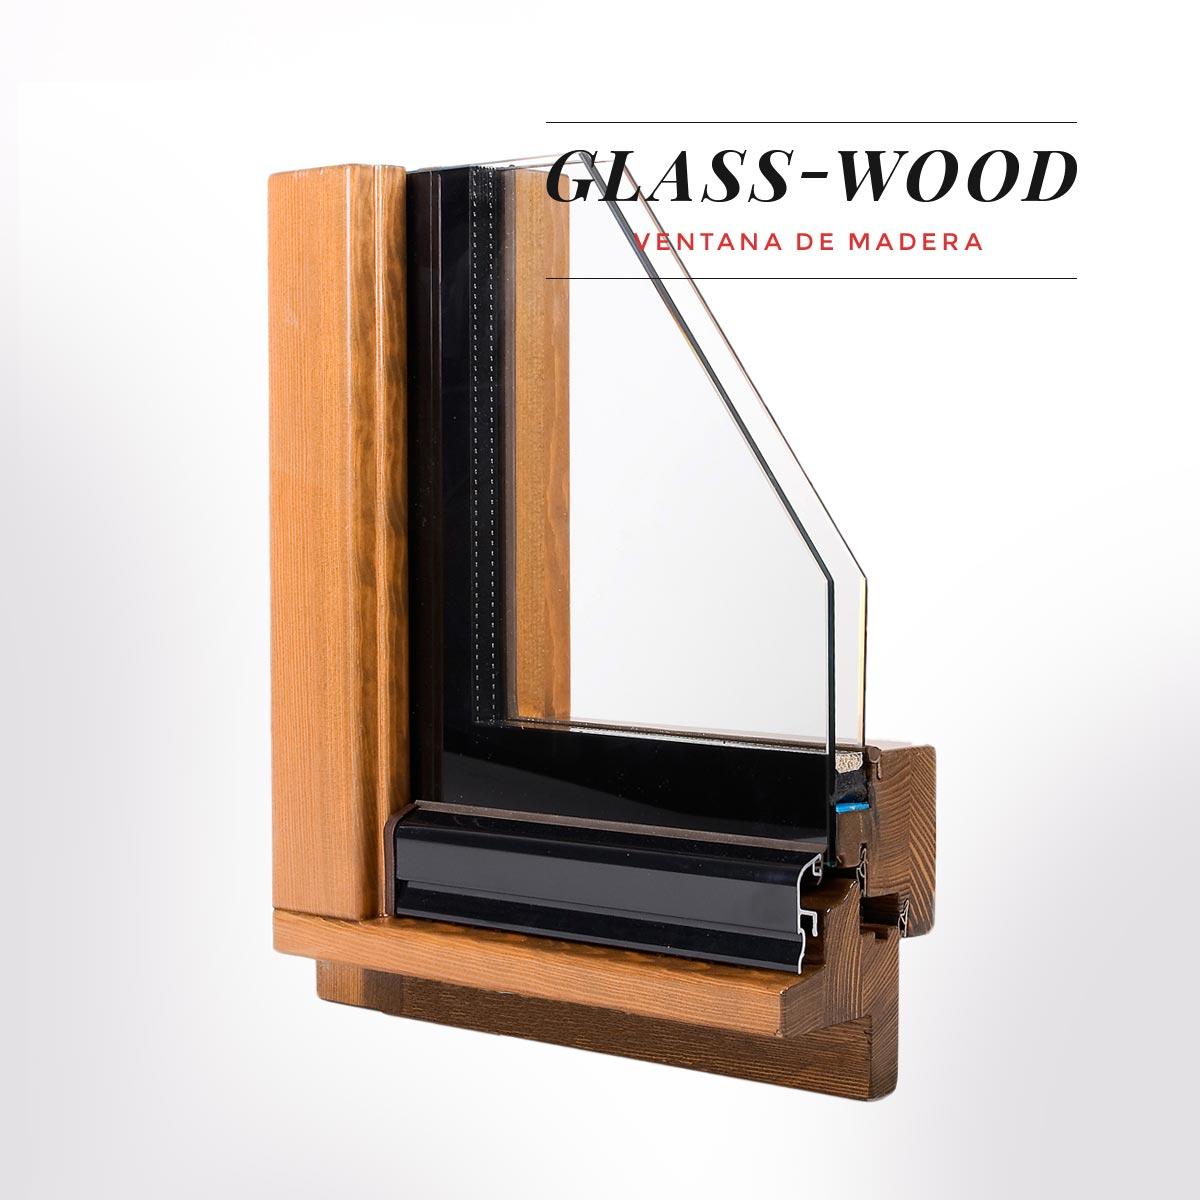 ventana de madera Glass Wood catalogo prdocutos carpinteria Carreté Finestres La Selva del Camp